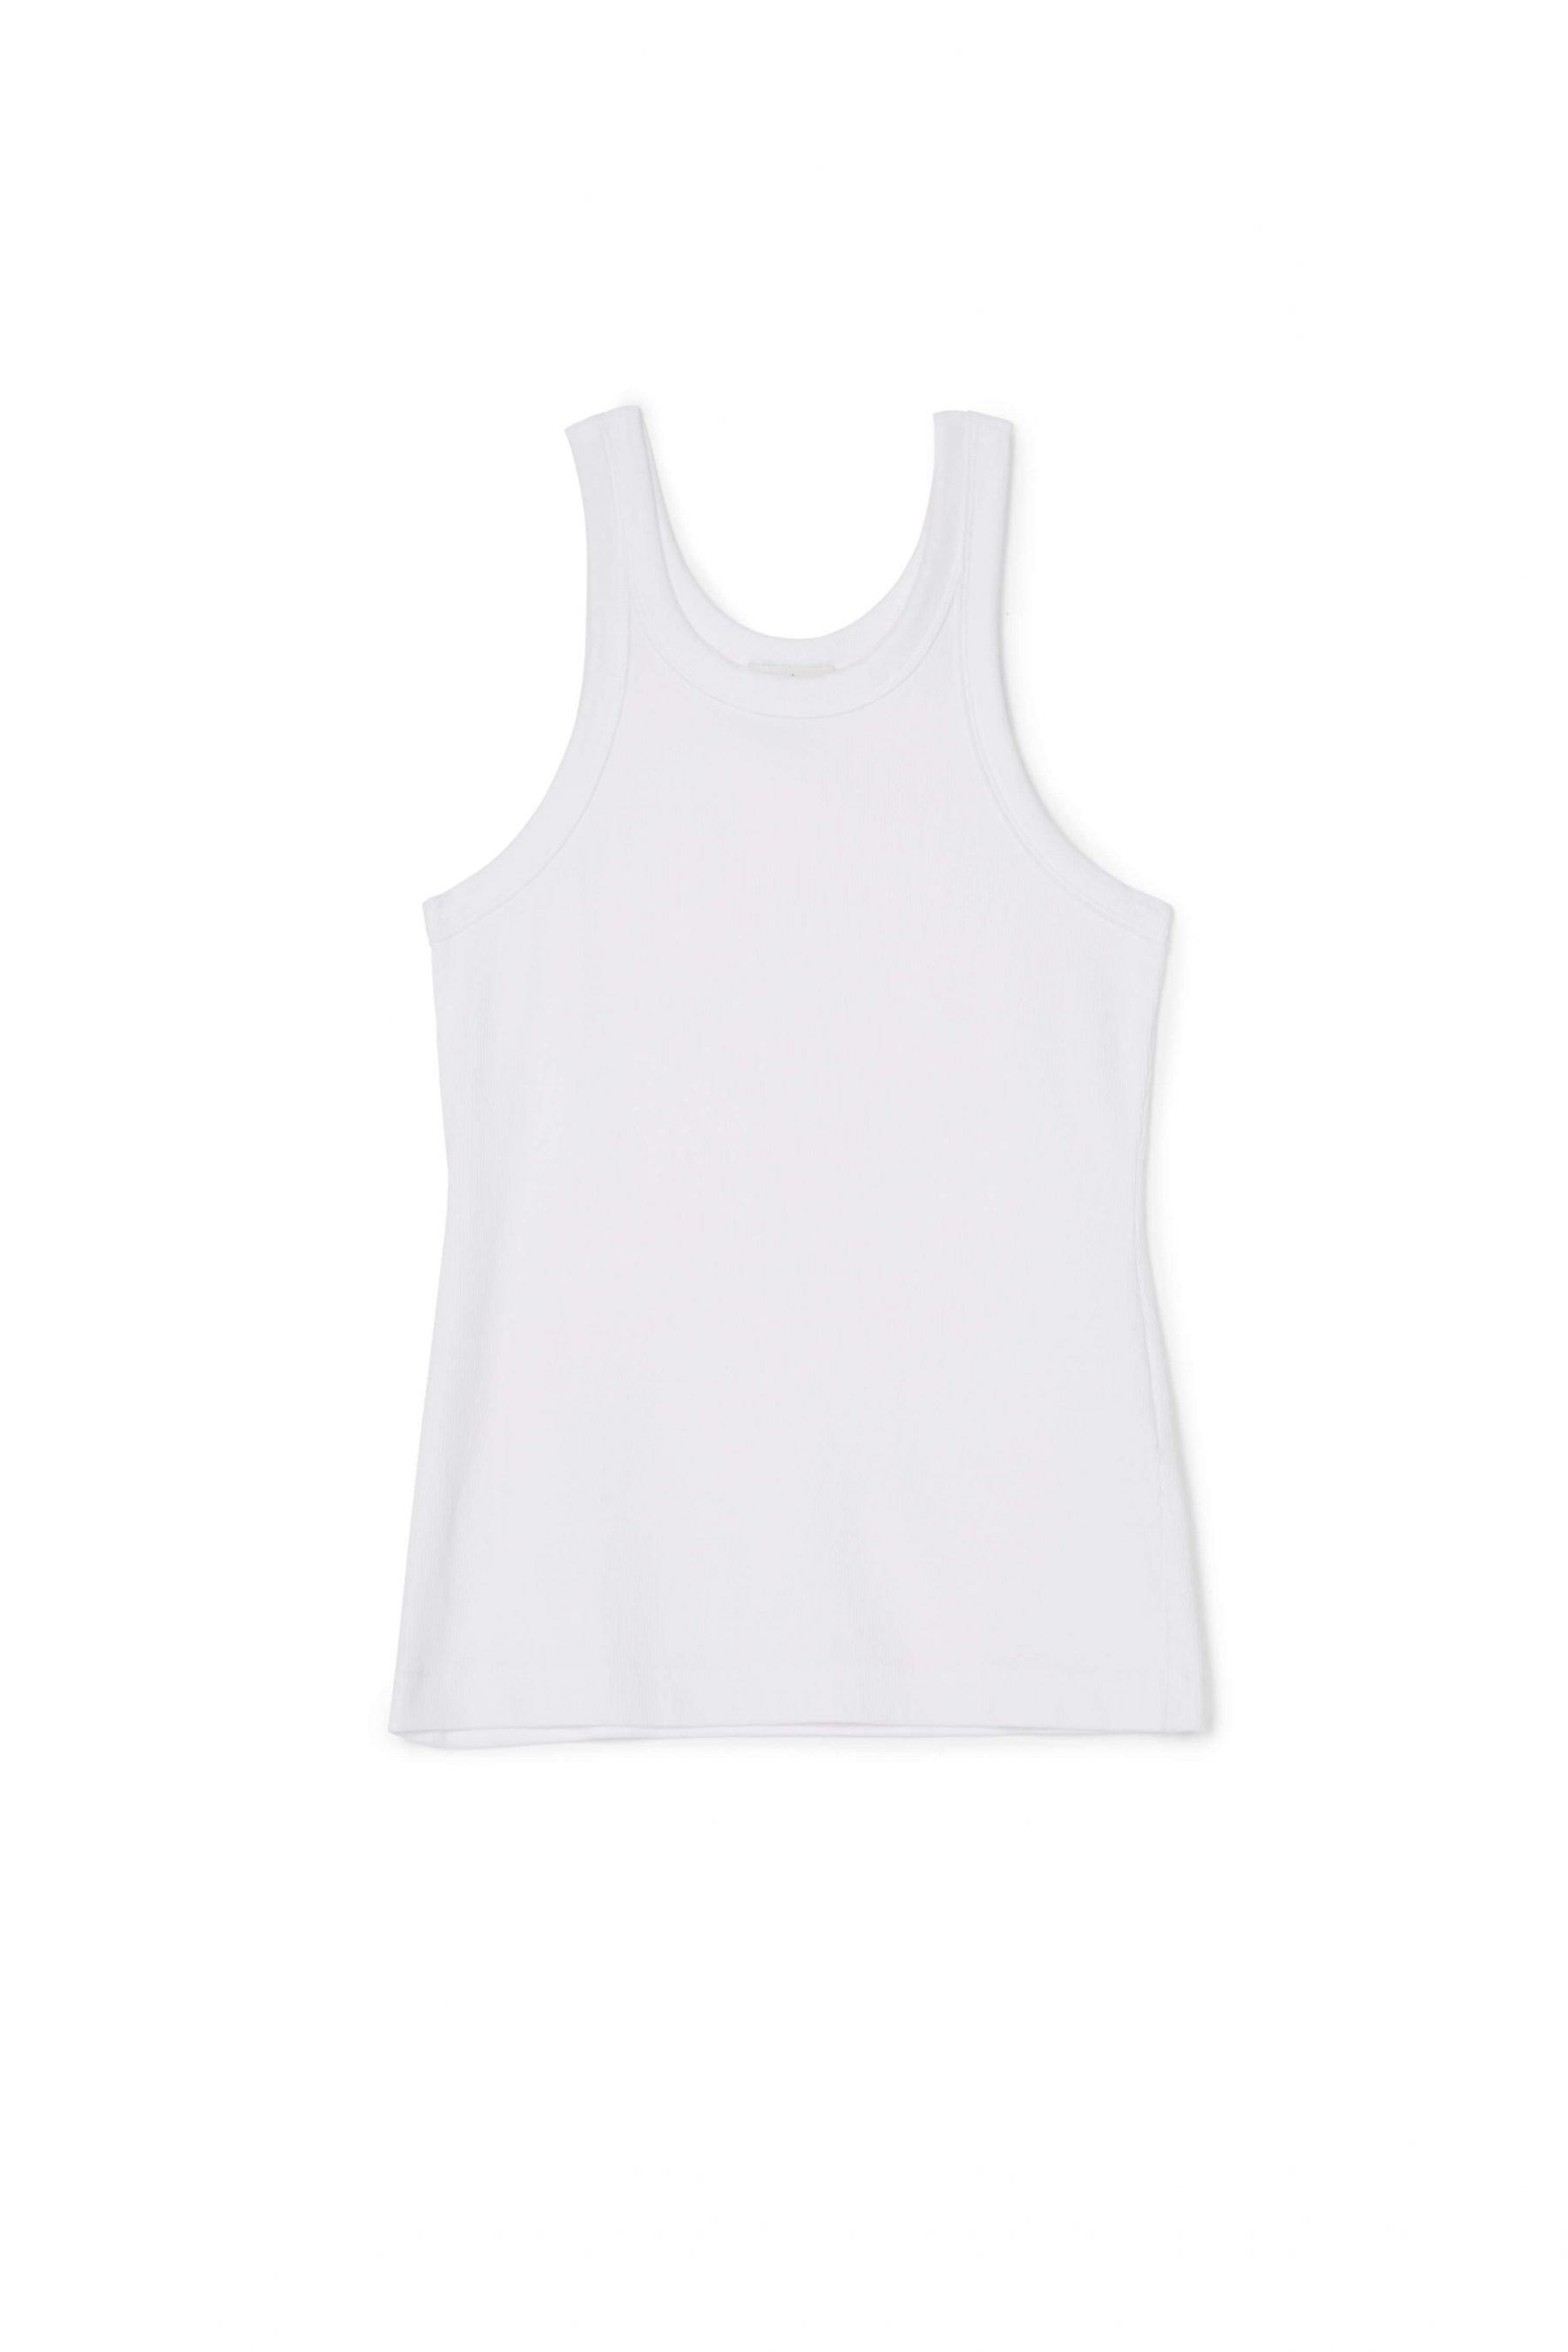 toteme_pf19_espera_tank_white-1800x2700.jpg